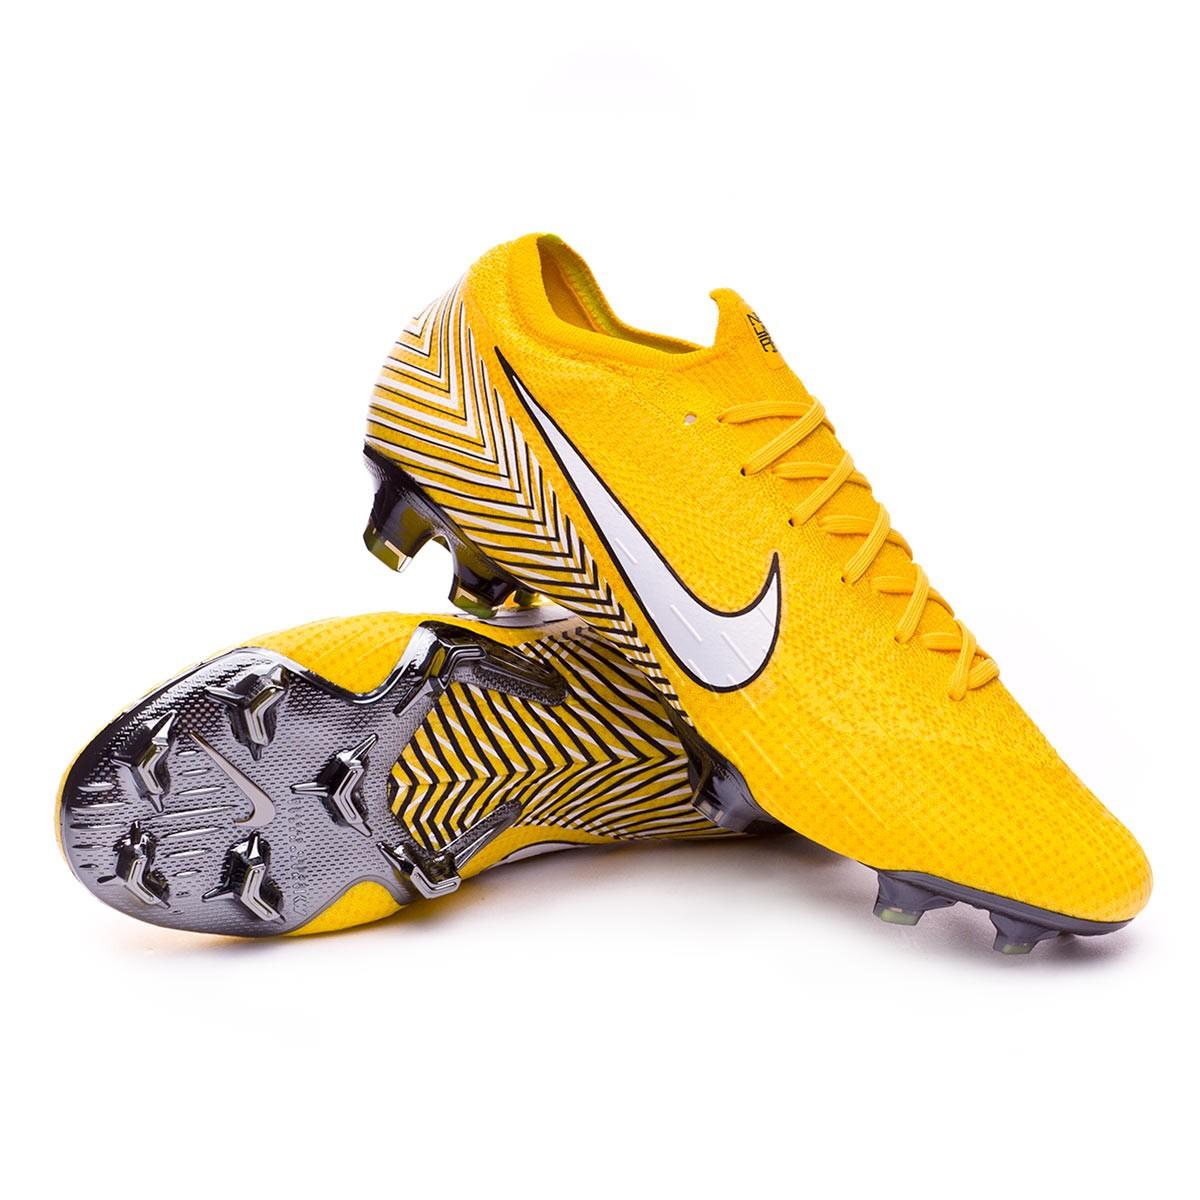 1f5f899a2593 Football Boots Nike Mercurial Vapor XII Elite FG Neymar Yellow-Dinamic  yellow-Black - Tienda de fútbol Fútbol Emotion